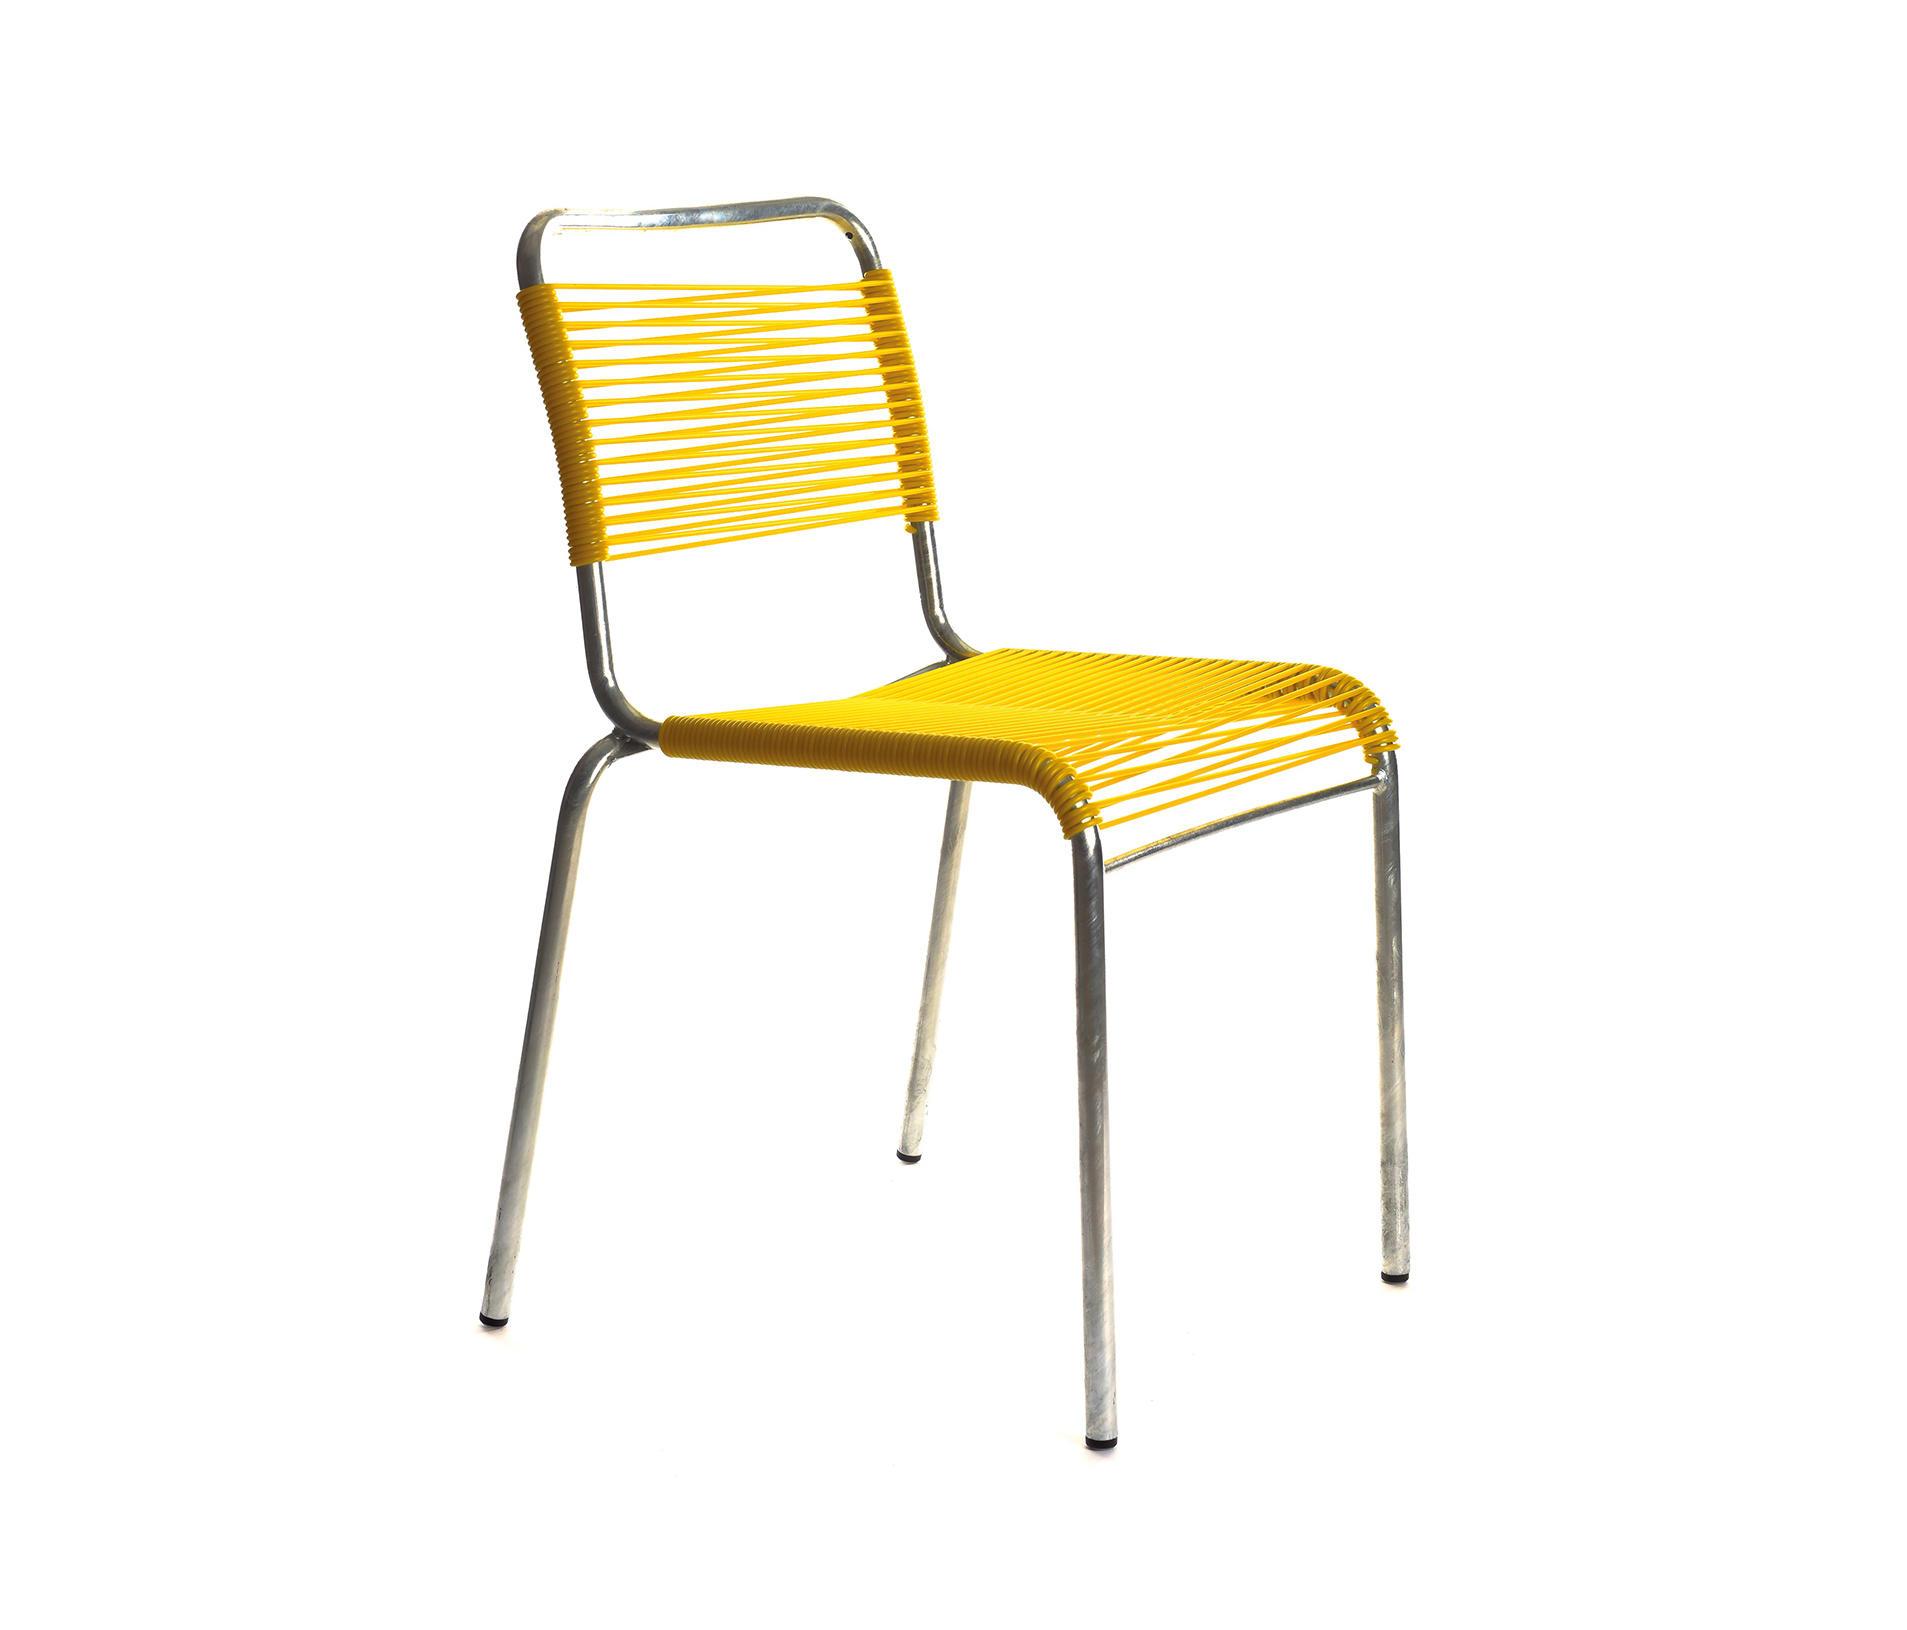 spaghetti stuhl 10 restaurant chairs from manufakt. Black Bedroom Furniture Sets. Home Design Ideas